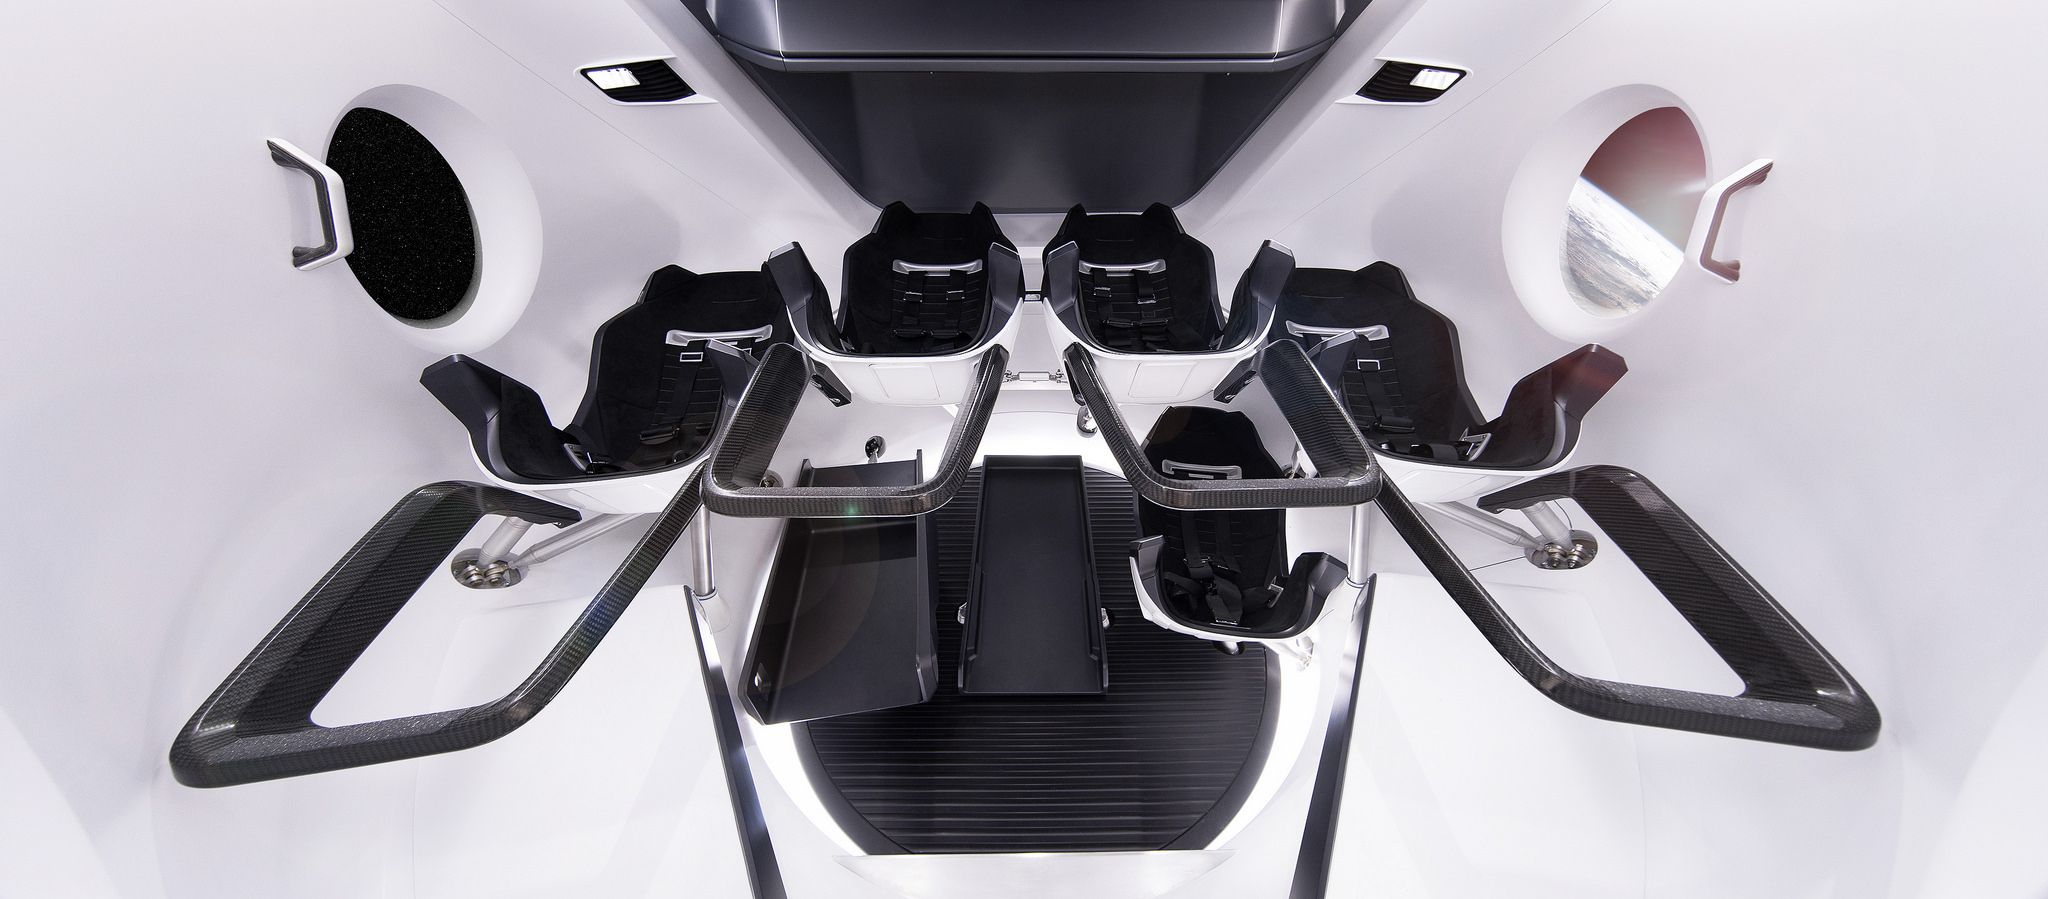 Crew Dragon Interior Spacex Spaceship Interior Transportation